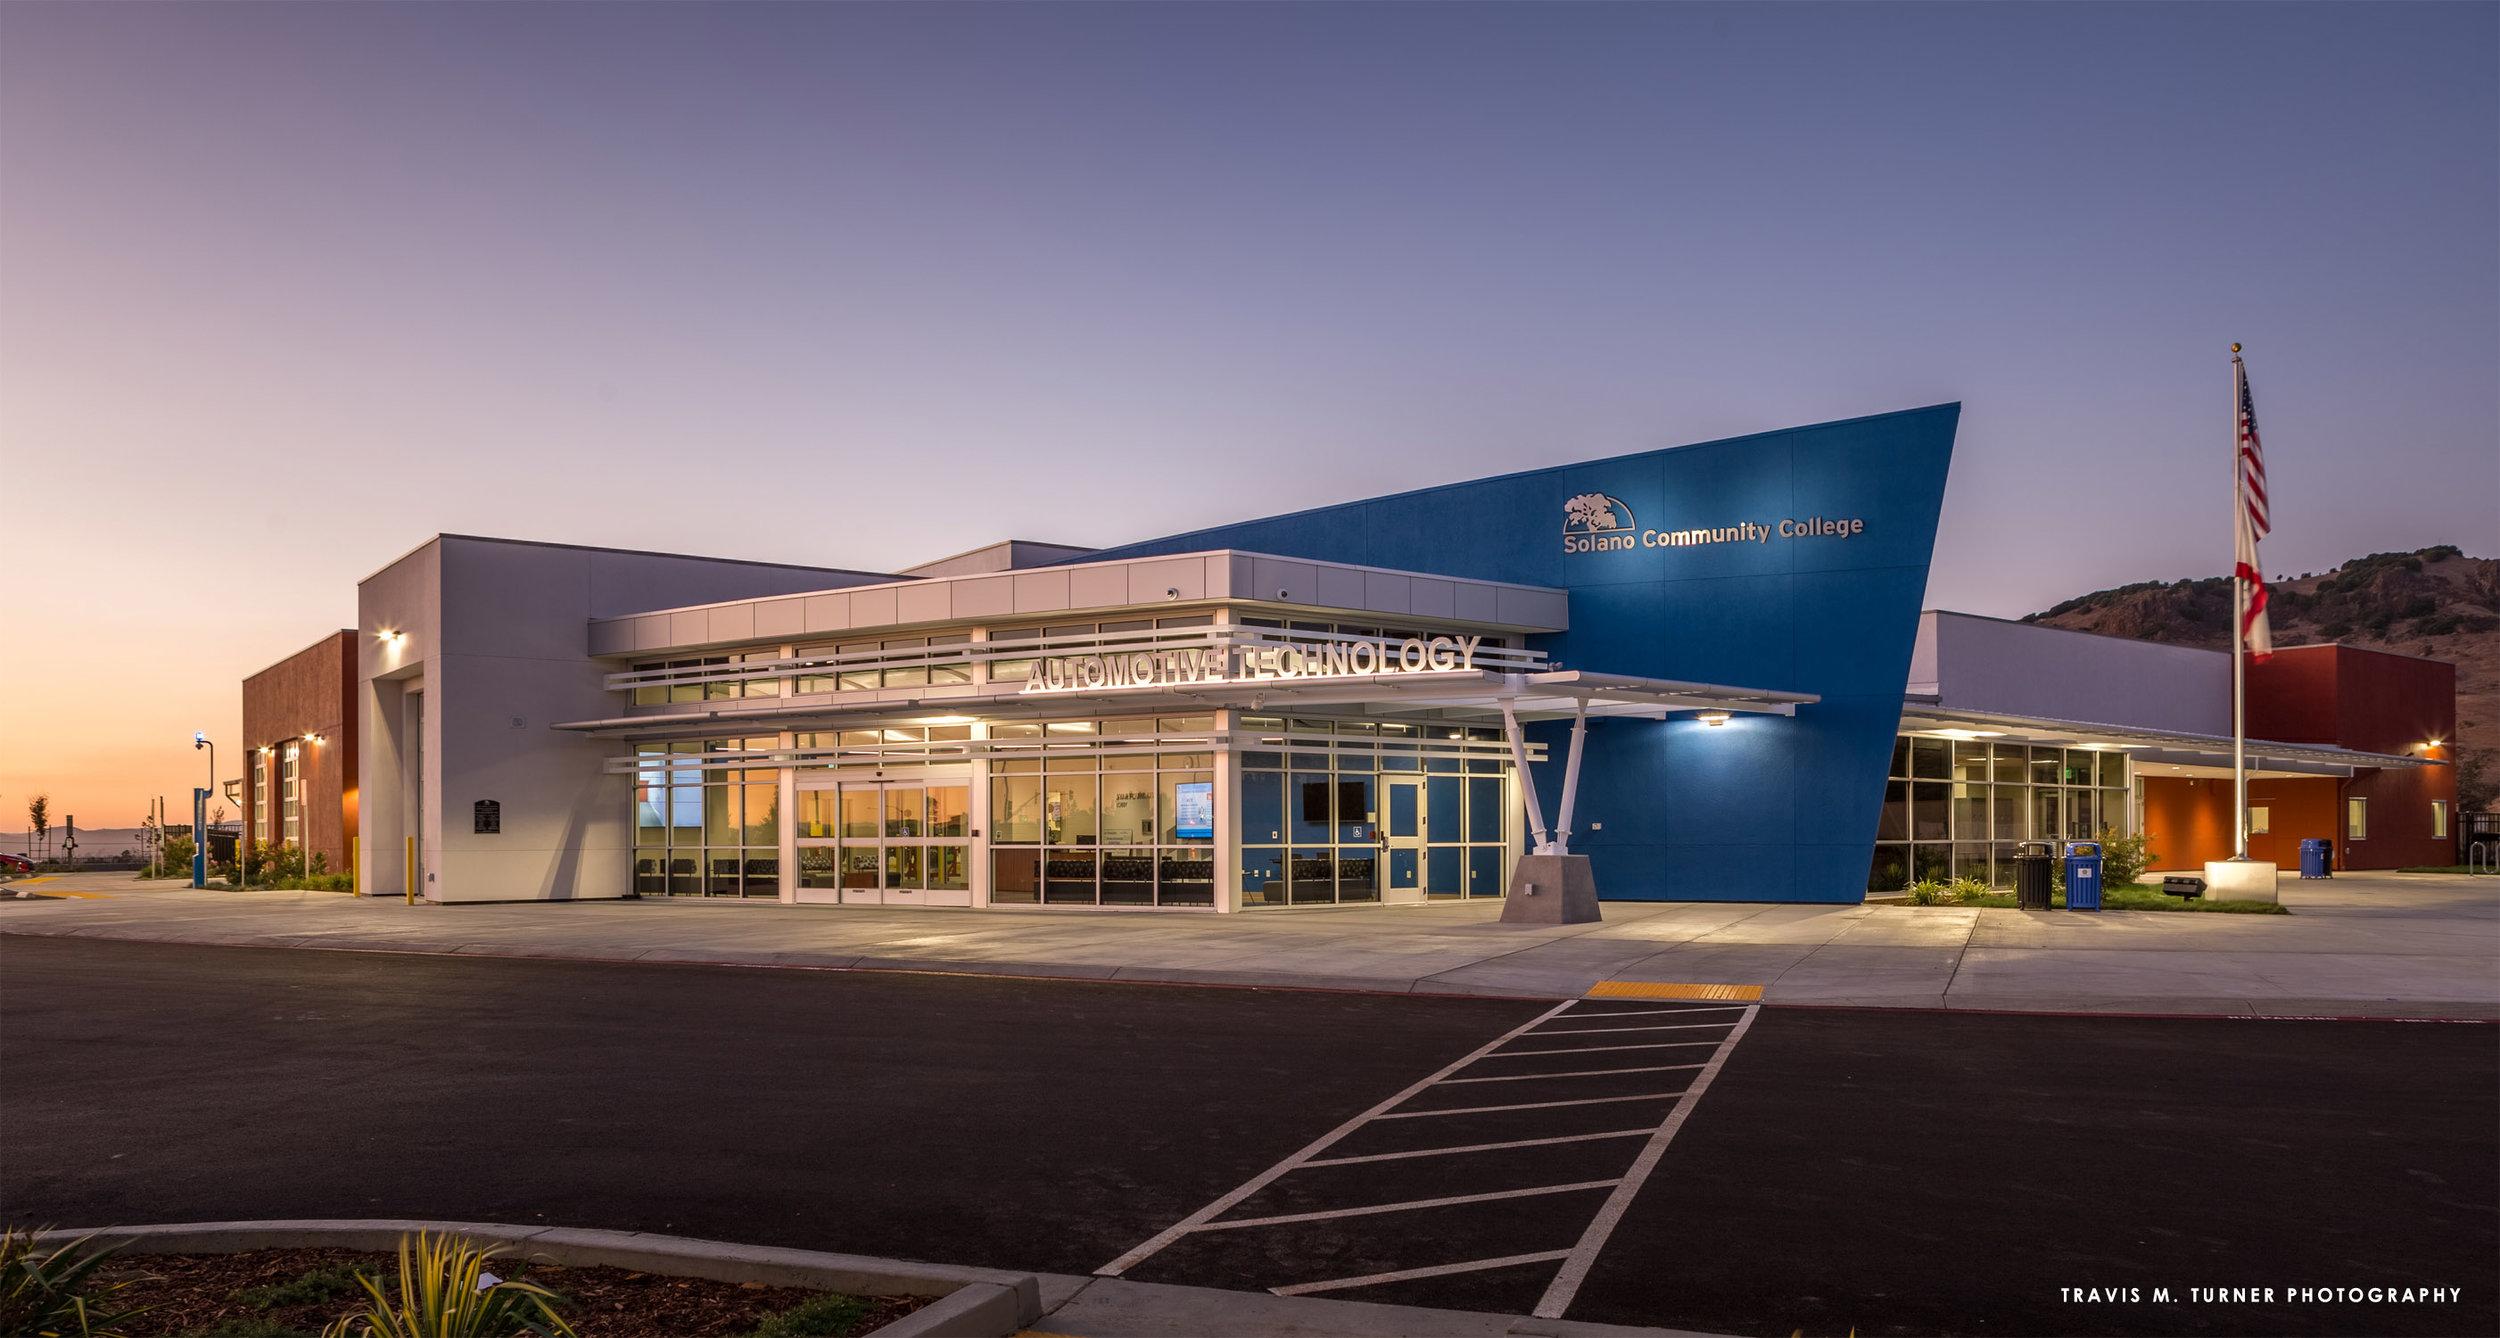 SOLANO COMMUNITY COLLEGE - AUTOMOTIVE TECHNOLOGY CENTER (W/ JK ARCHITECTURE)